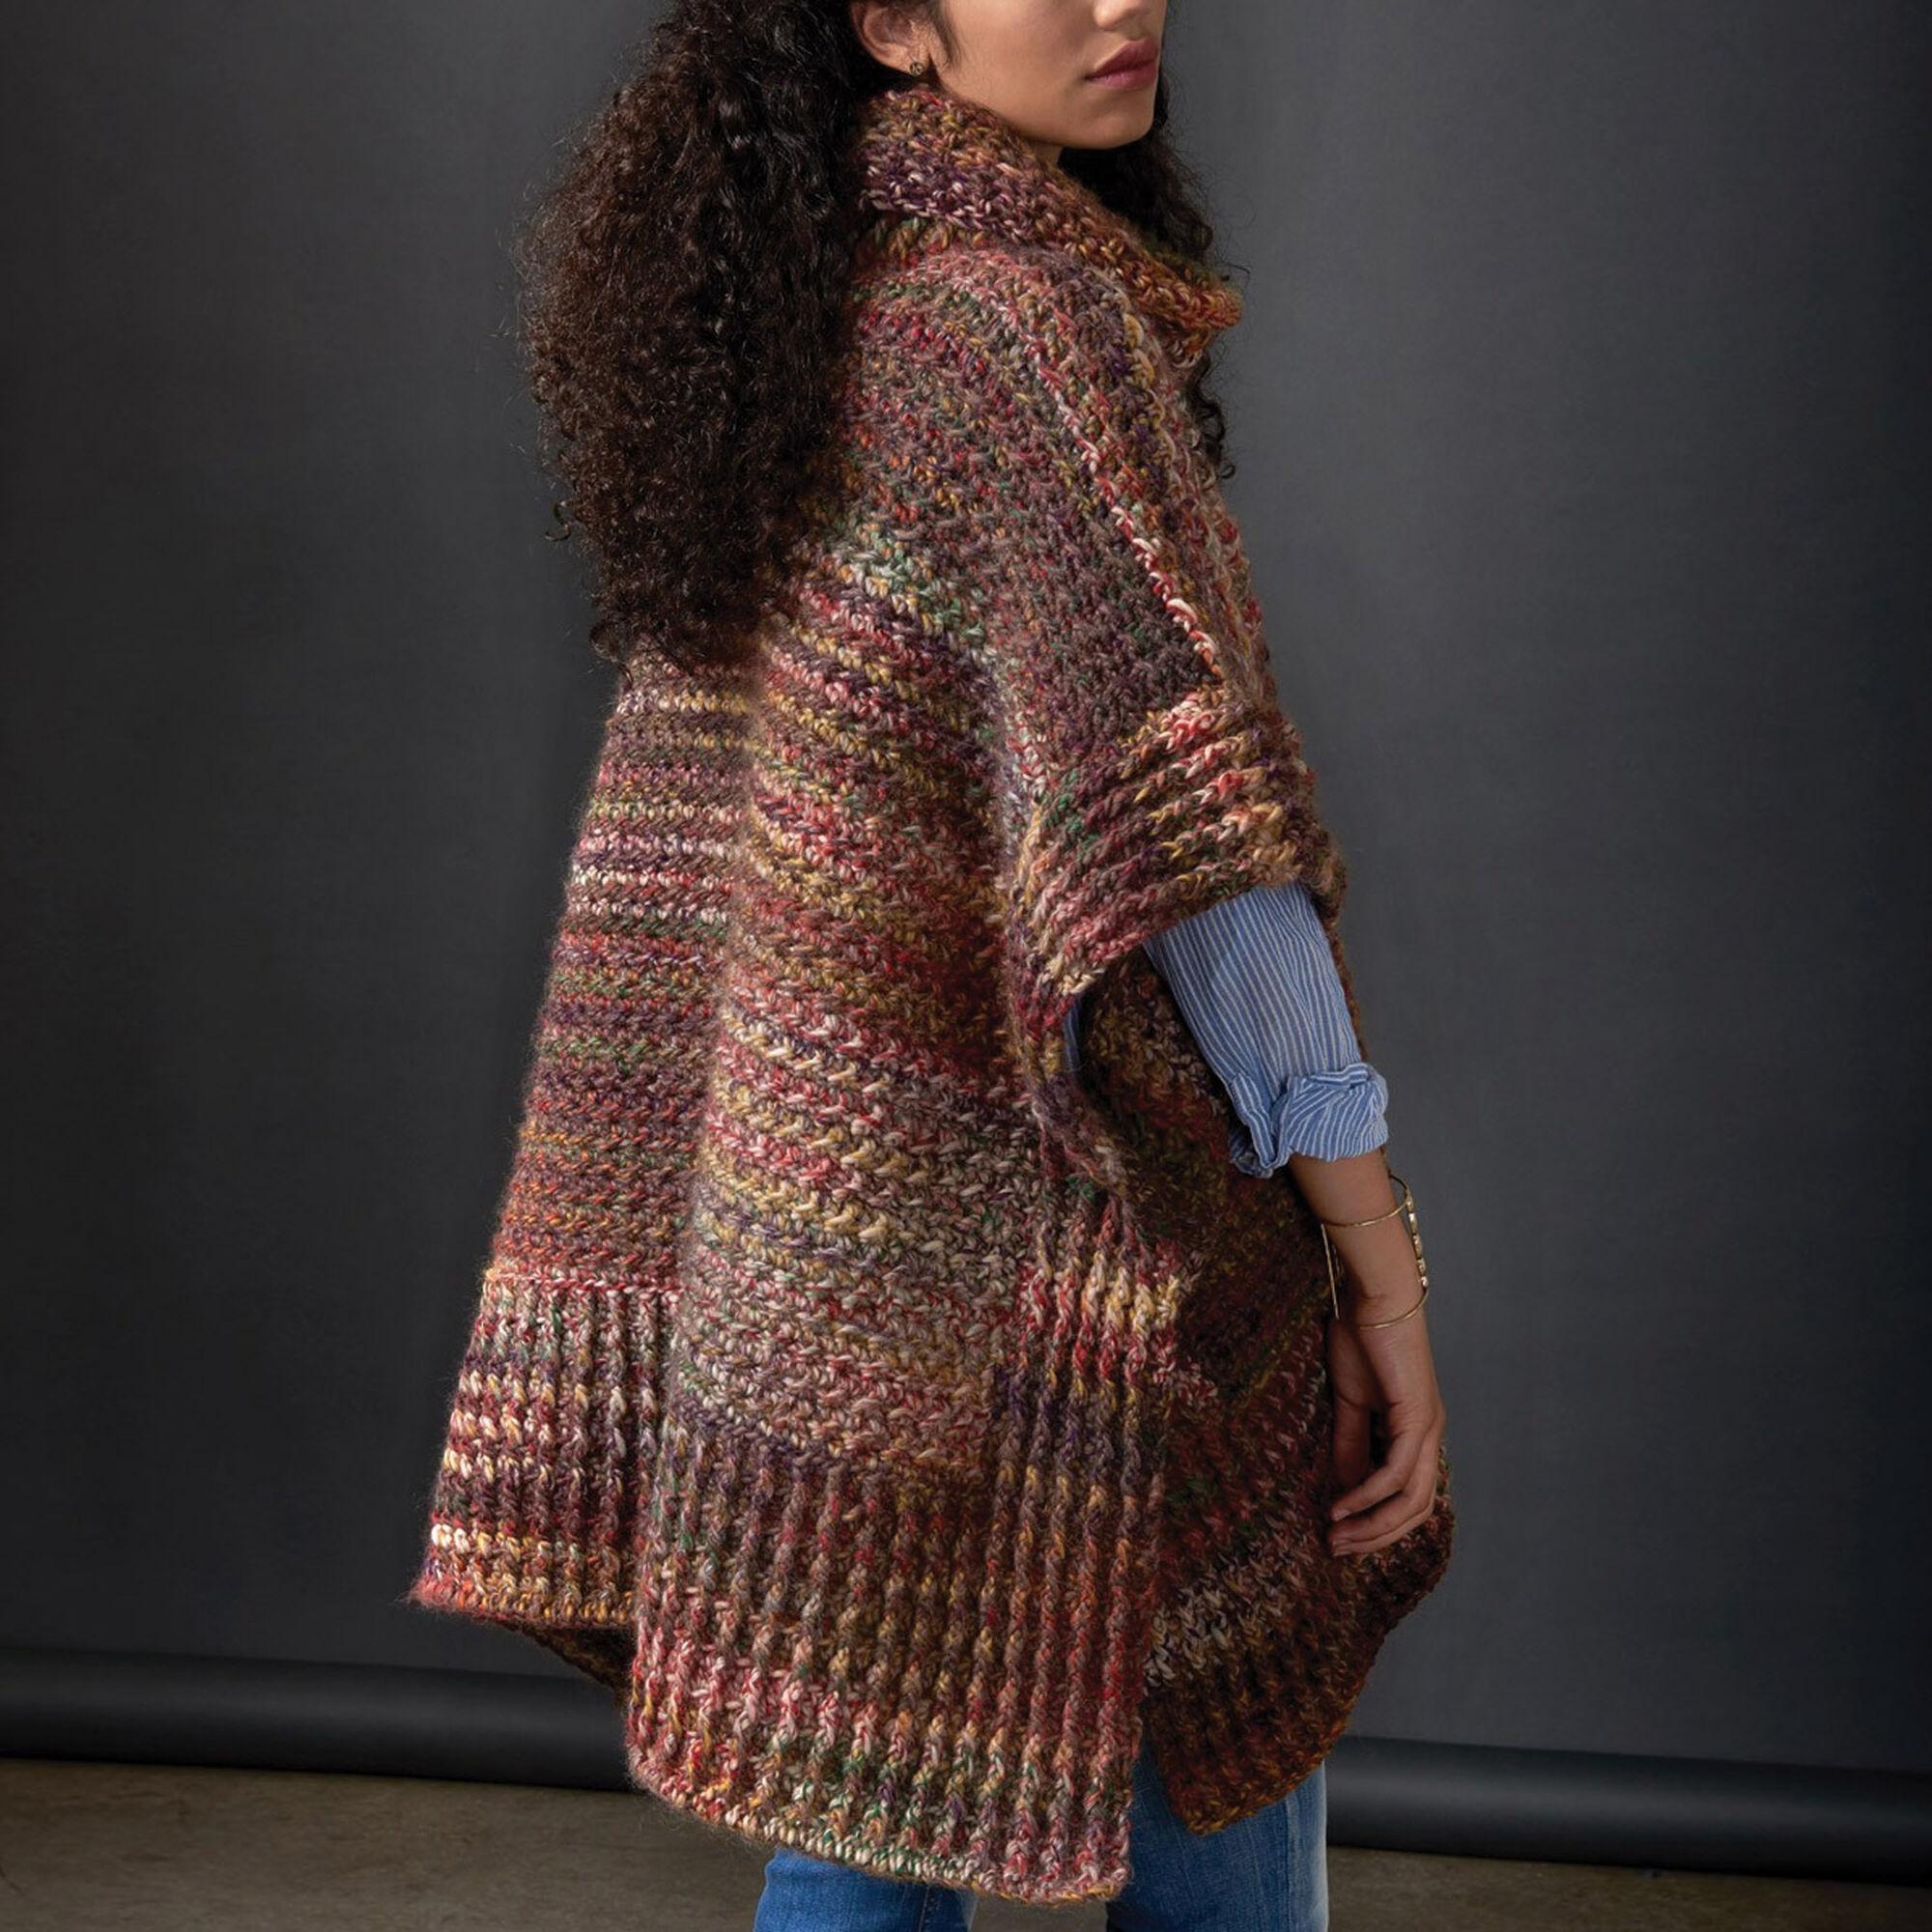 Patons Tweed Under Wraps, XS/M | Yarnspirations